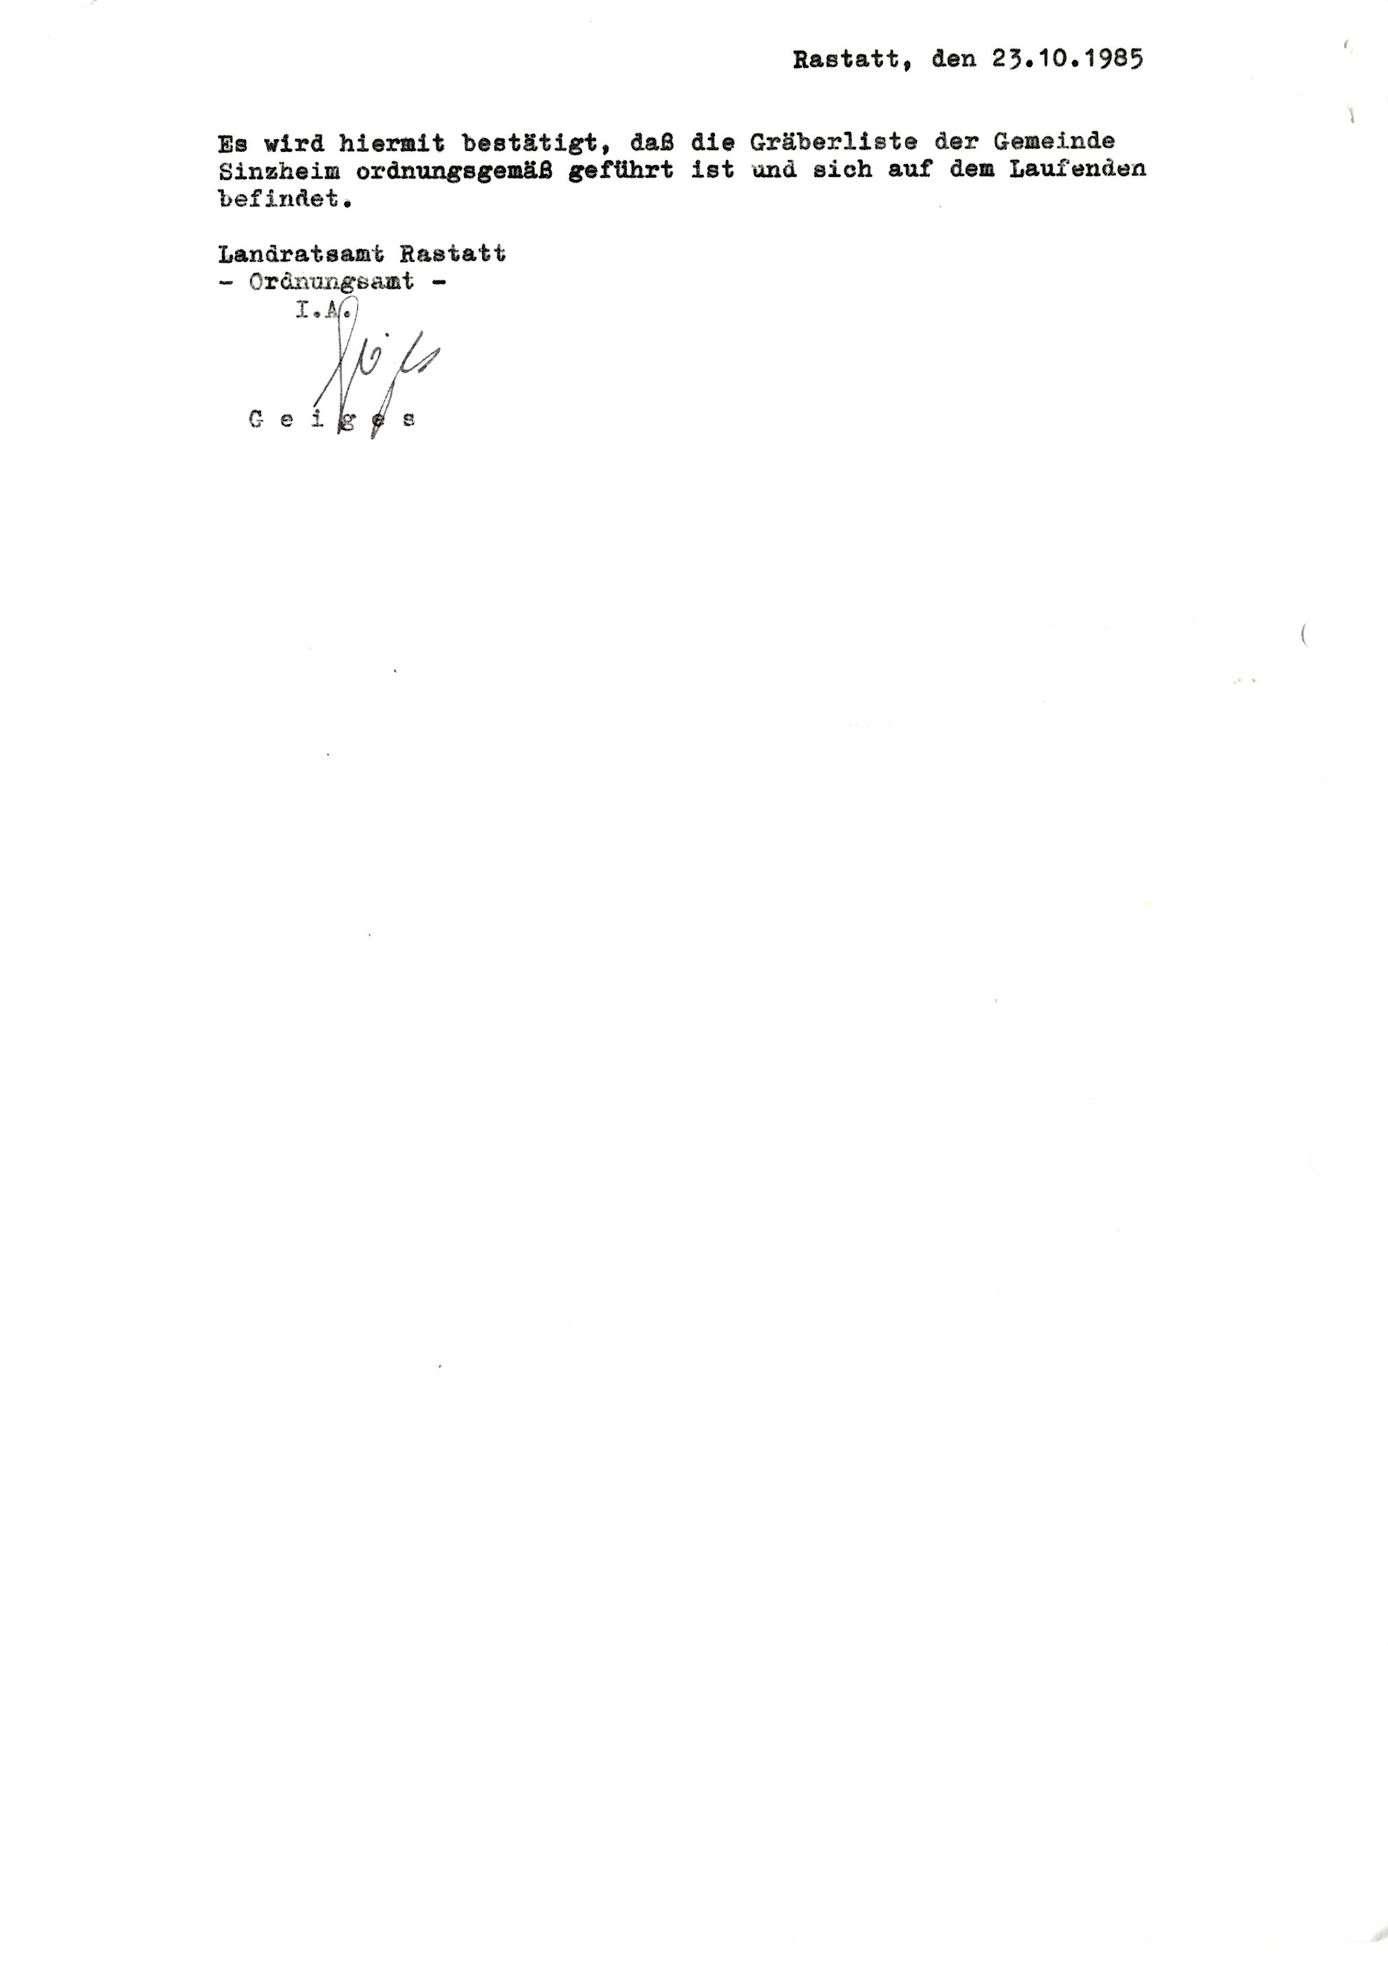 Leiberstung, Bild 2